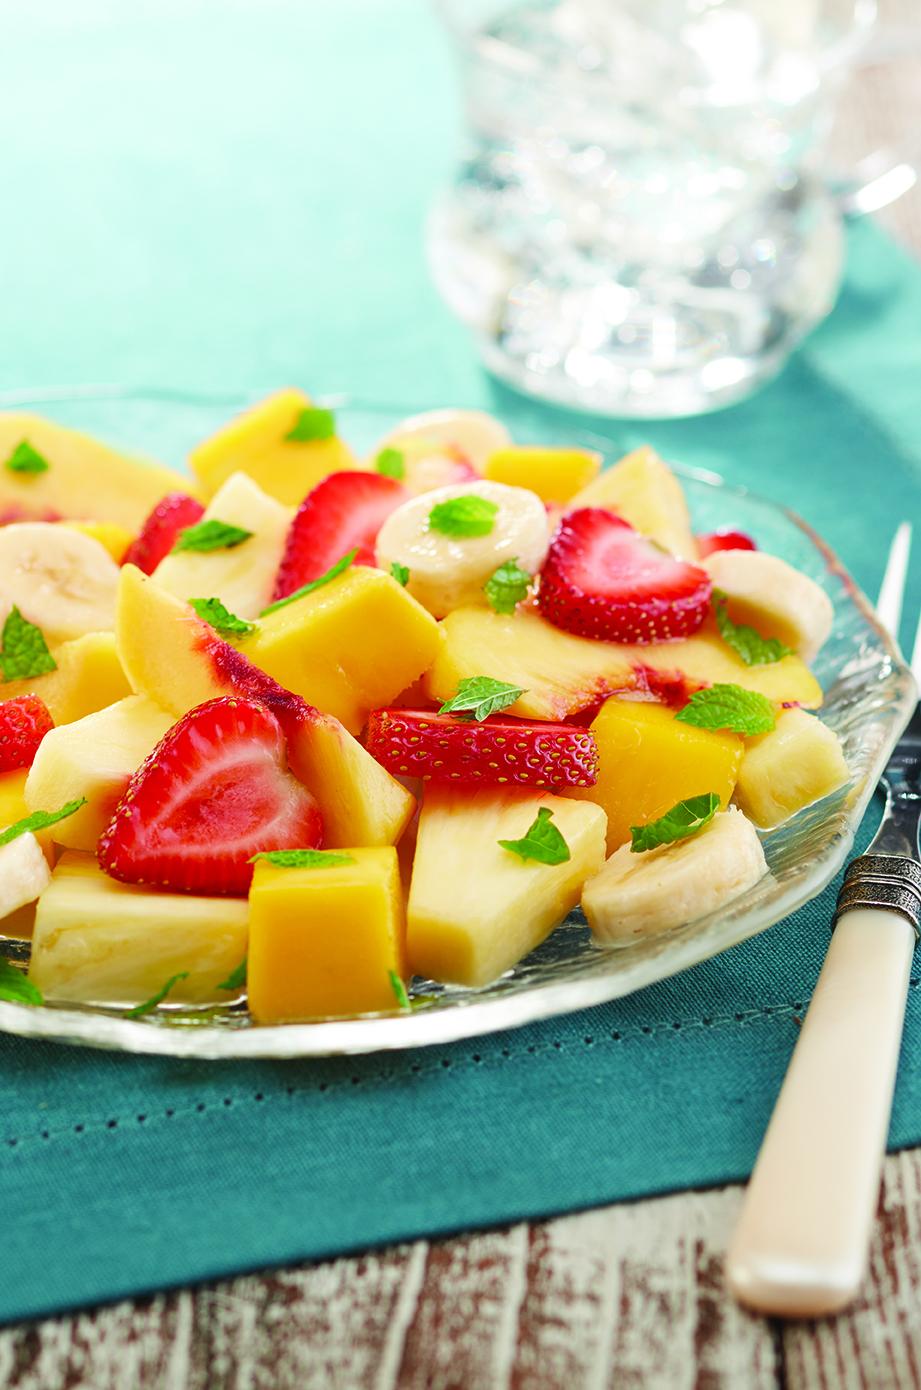 Photo of Minted Ginger Fruit Salad